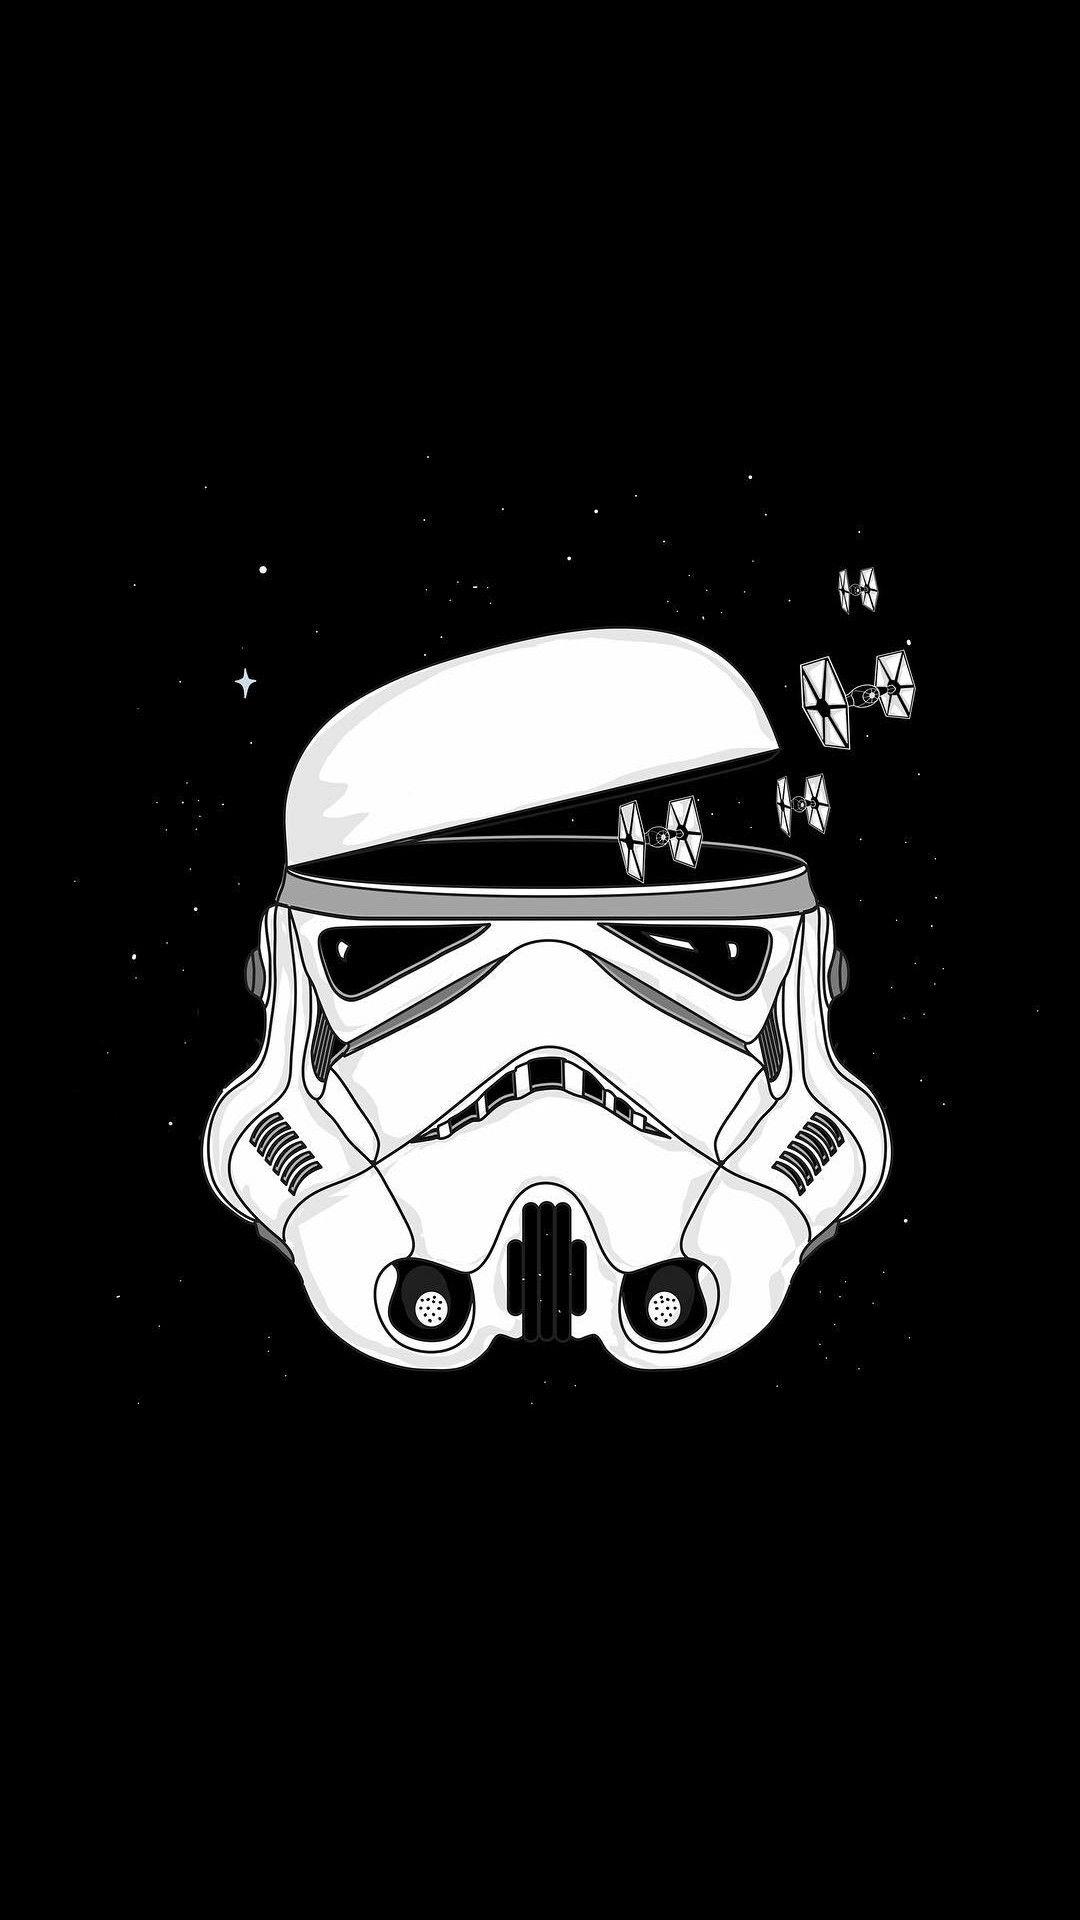 Pin By Iyan Sofyan On Super Heroes Pictures Star Wars Art Star Wars Wallpaper Star Wars Trooper